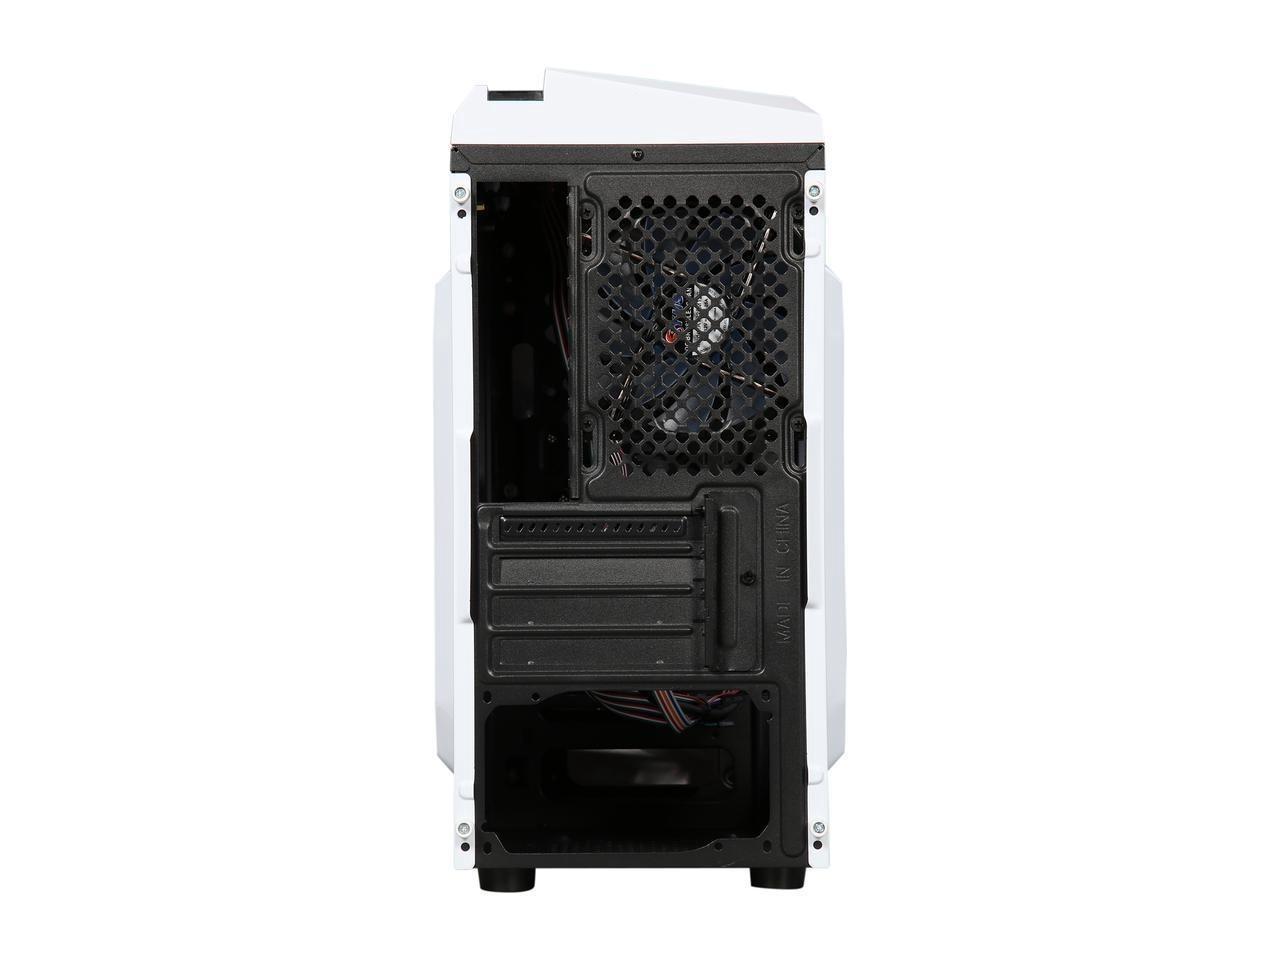 Diypc Diy F2 W White Spcc Microatx Mini Tower Computer